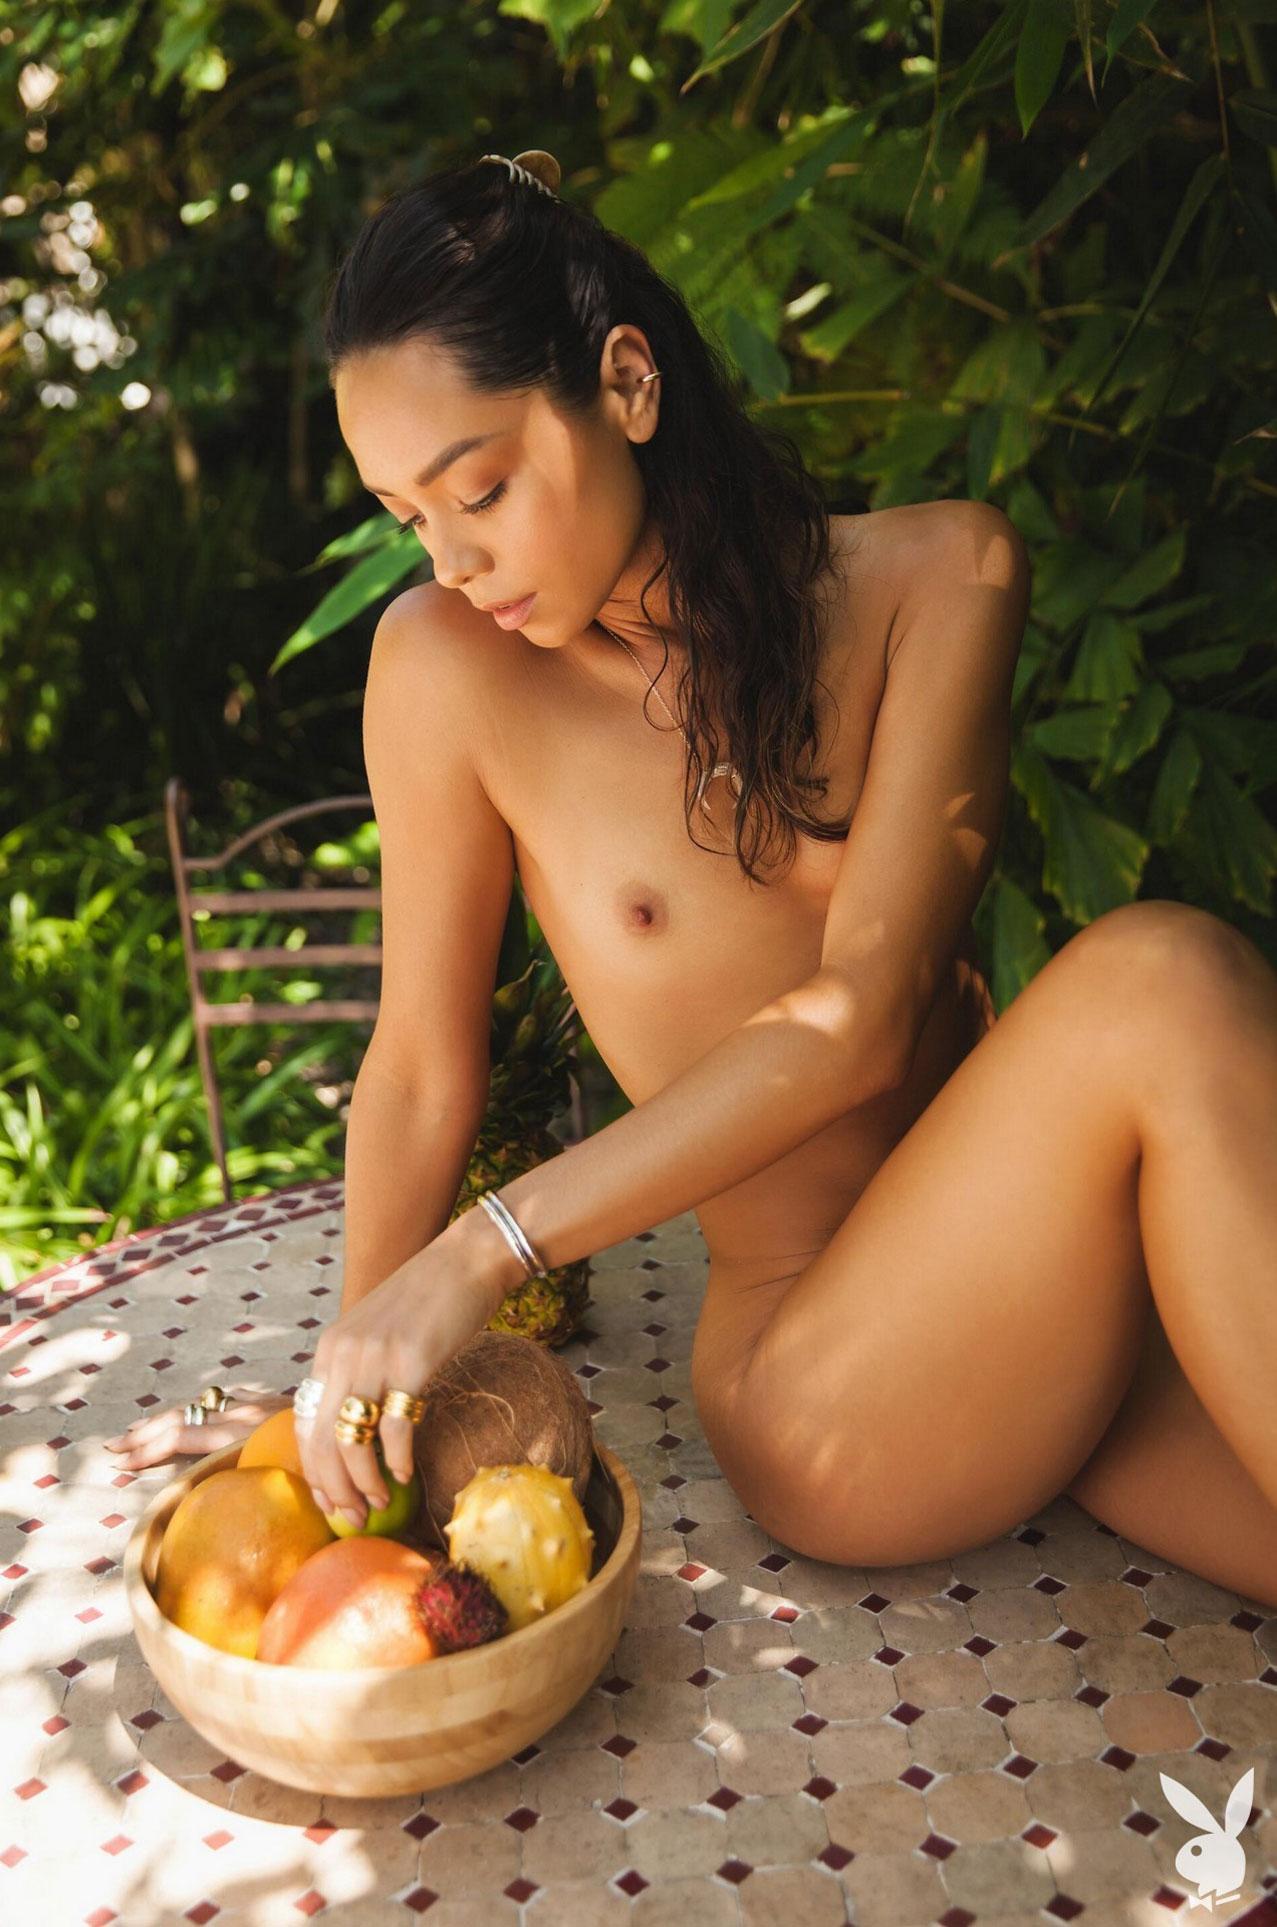 Девушка месяца Даниэлла Алькараз, Playboy США сентябрь 2020 / фото 11